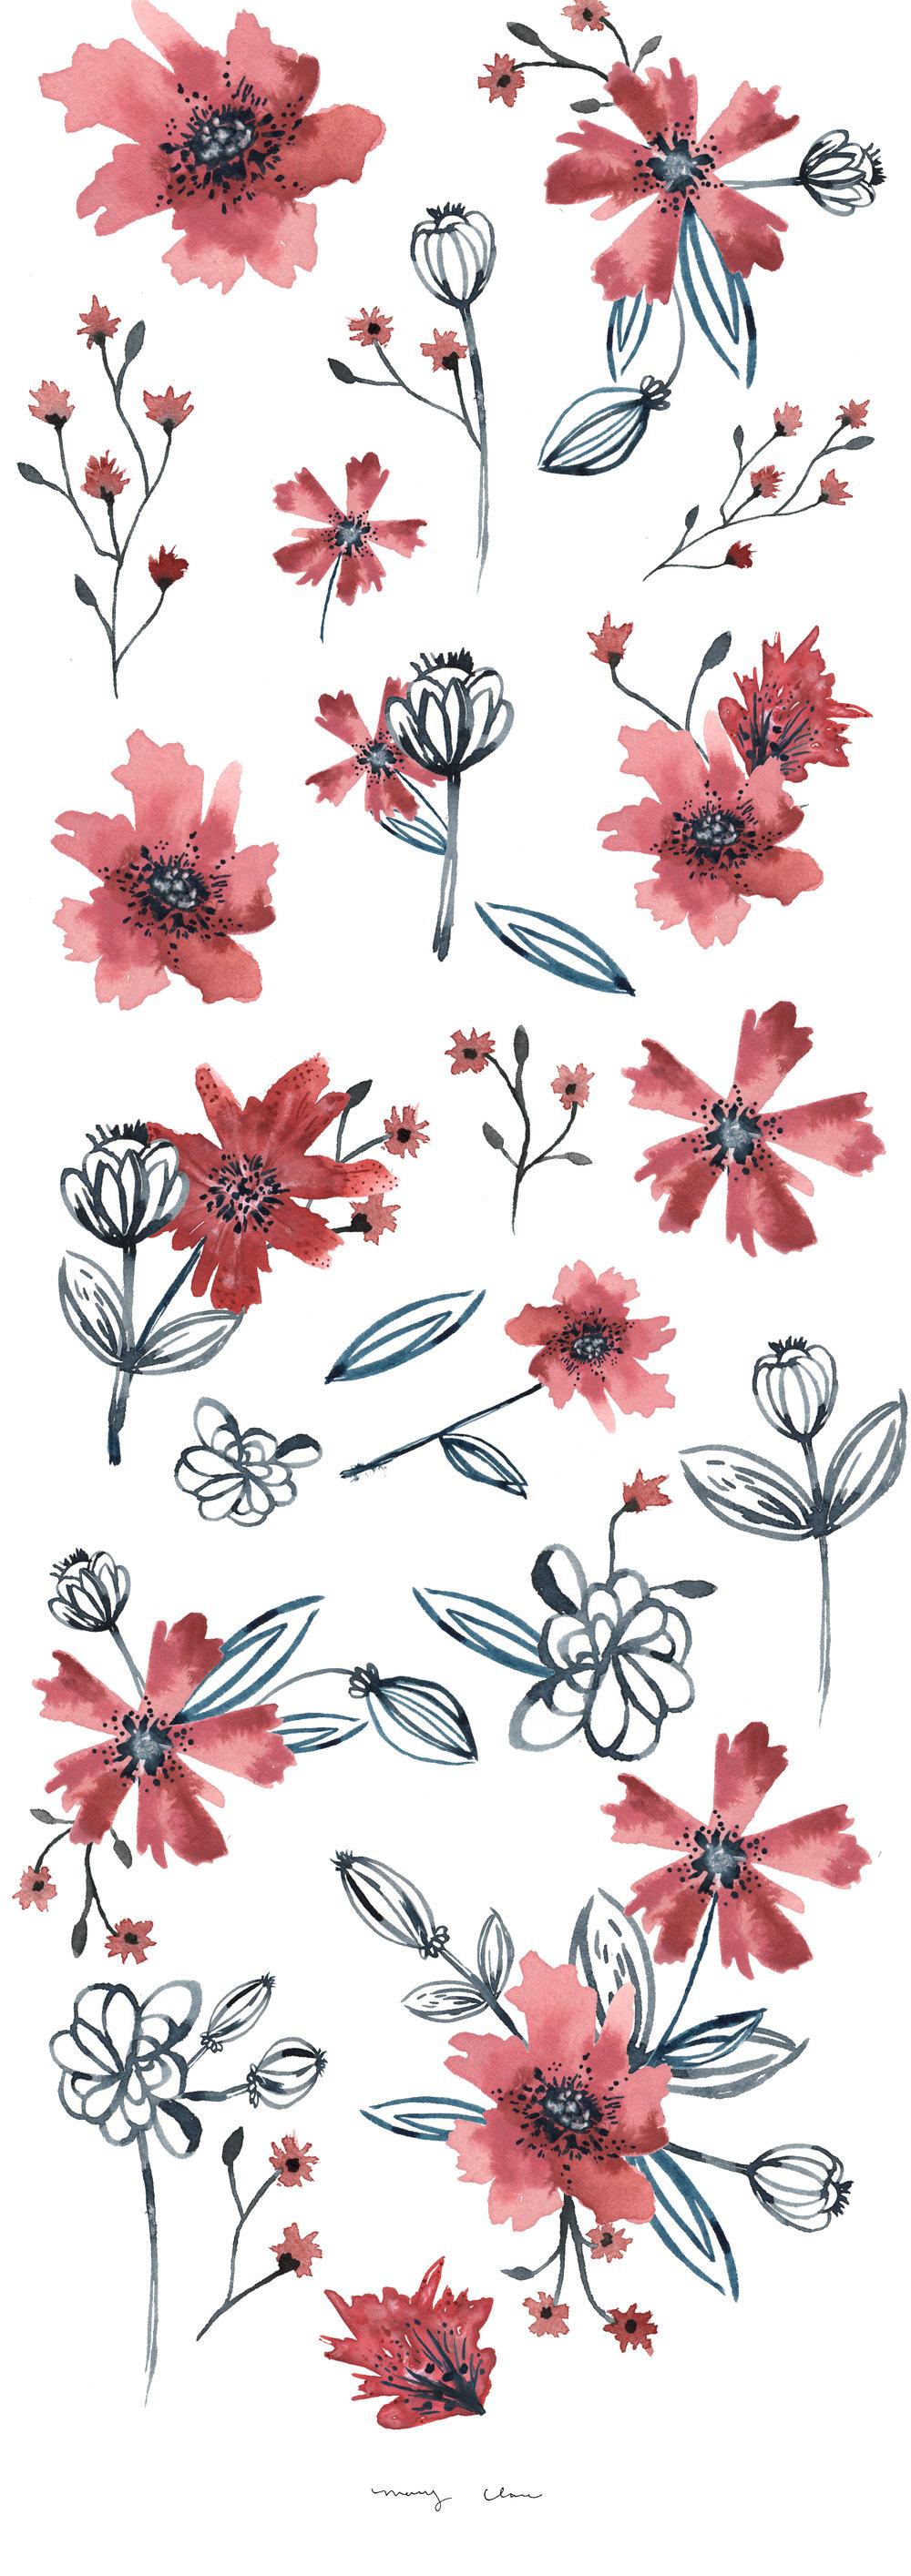 Rowhouses-redflowers-purpleflowers-maryclarewilkie-02.jpg